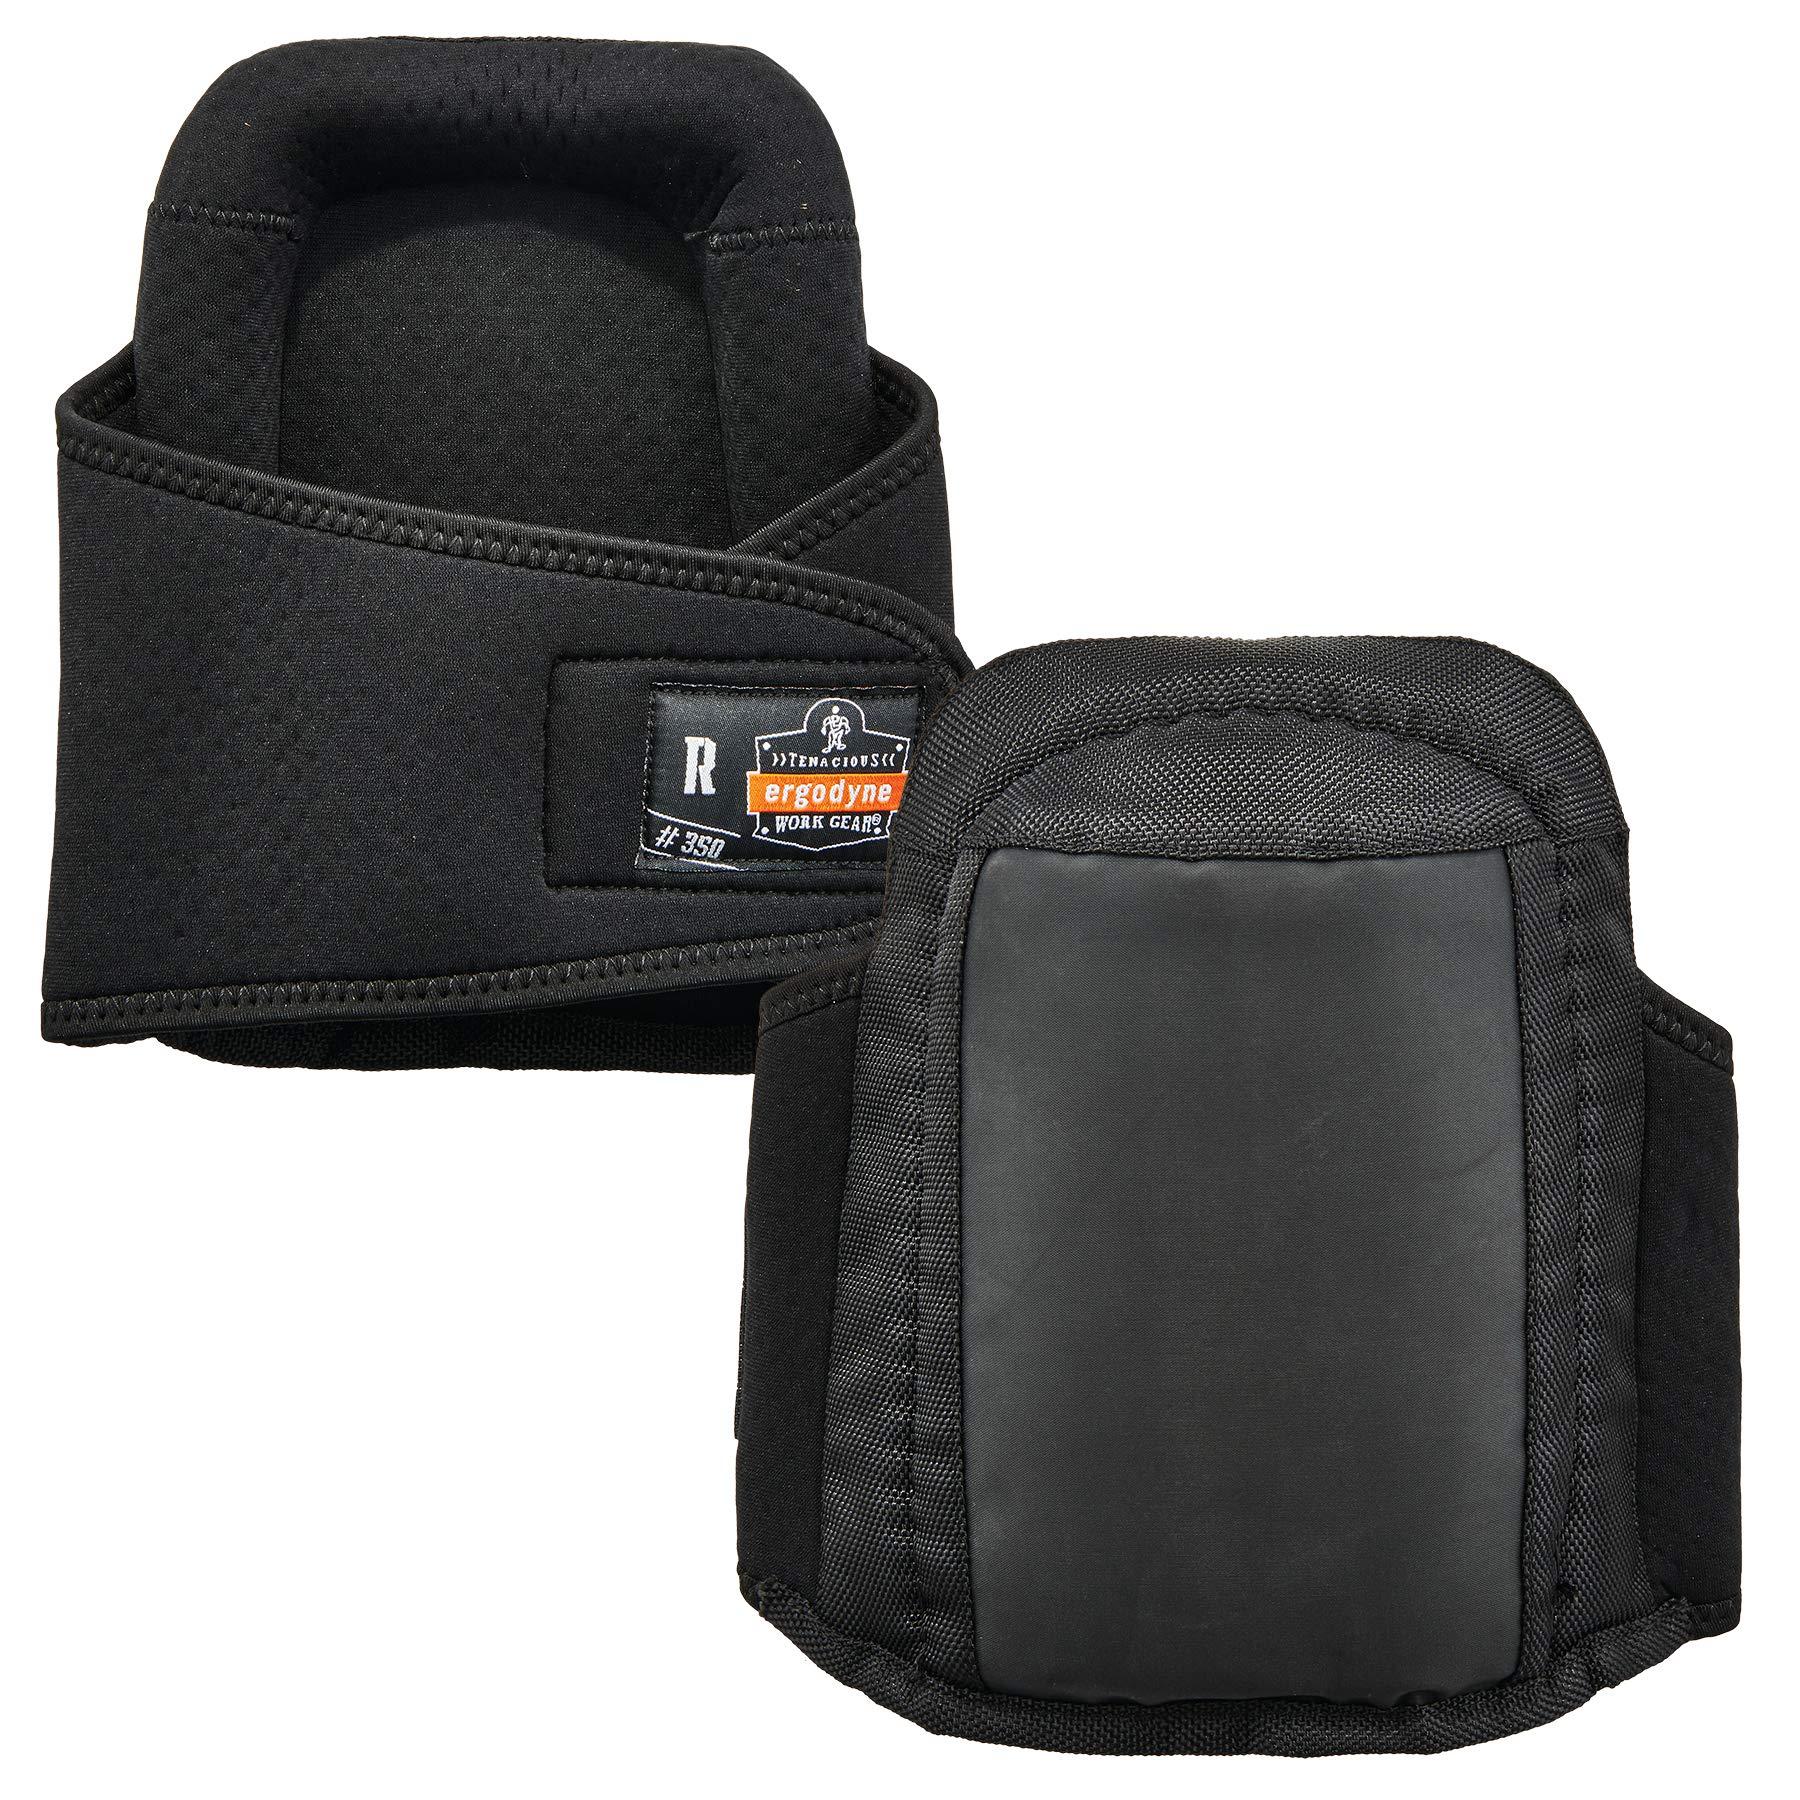 Ergodyne ProFlex 350 Protective Slip-Resistant Knee Pads, Gel Foam Padded Technology, Adjustable Straps, Black by Ergodyne